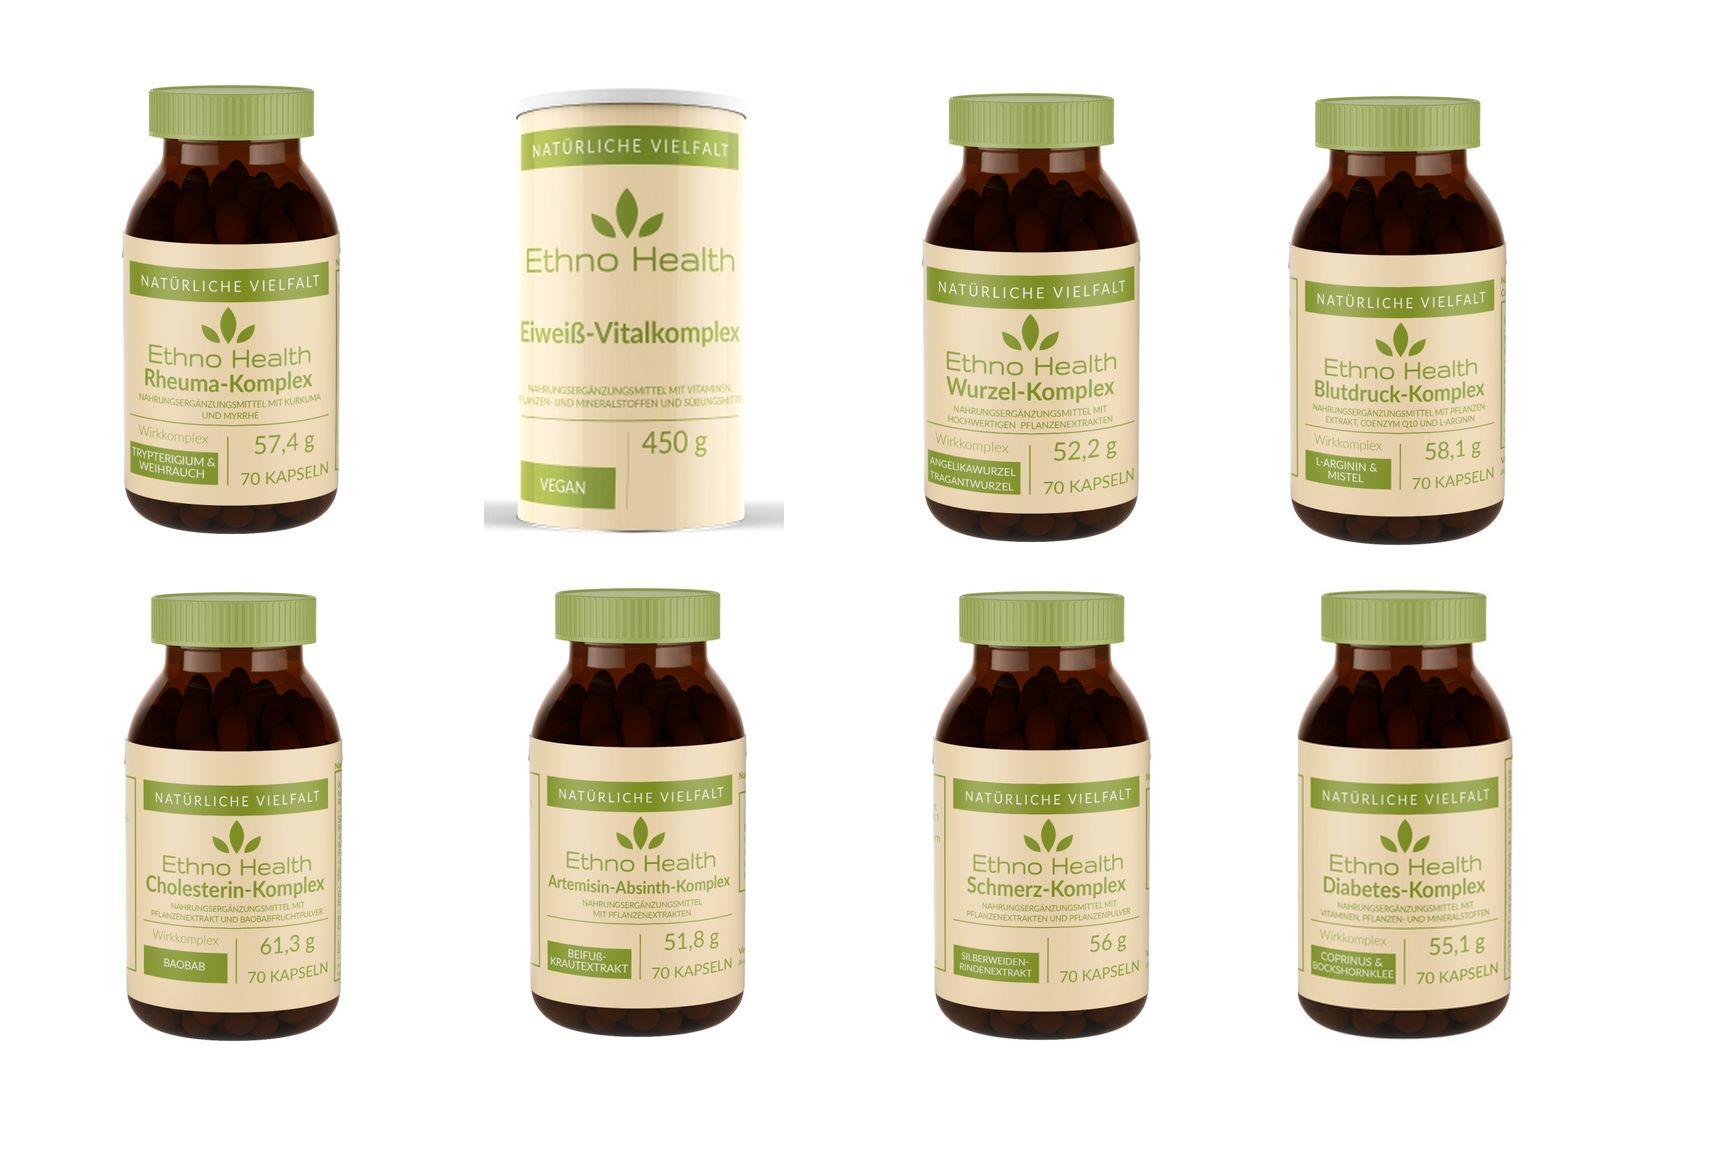 Ethno-Health-Produkte-Komplexe-Eiweiss